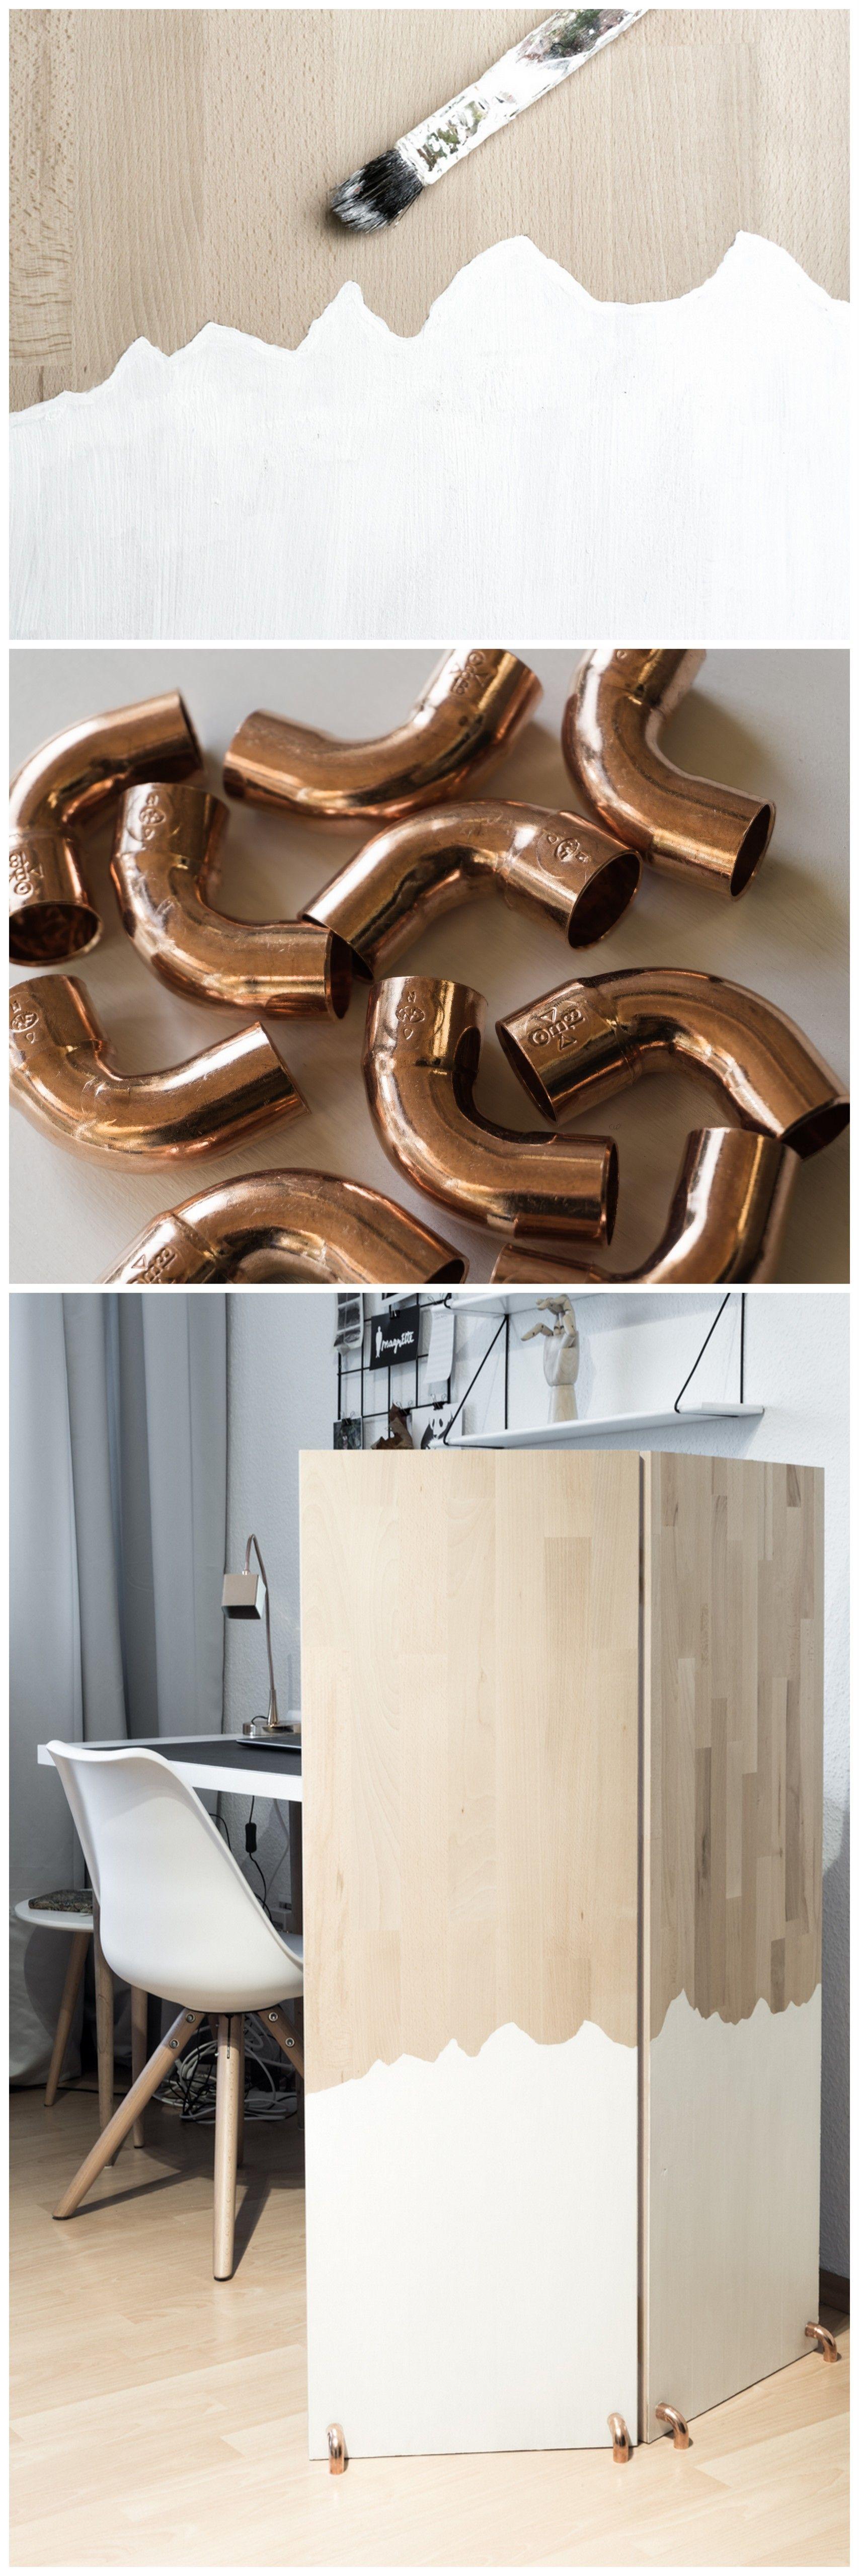 raumteiler selber bauen raumteiler raumteiler selber bauen und diy m bel. Black Bedroom Furniture Sets. Home Design Ideas